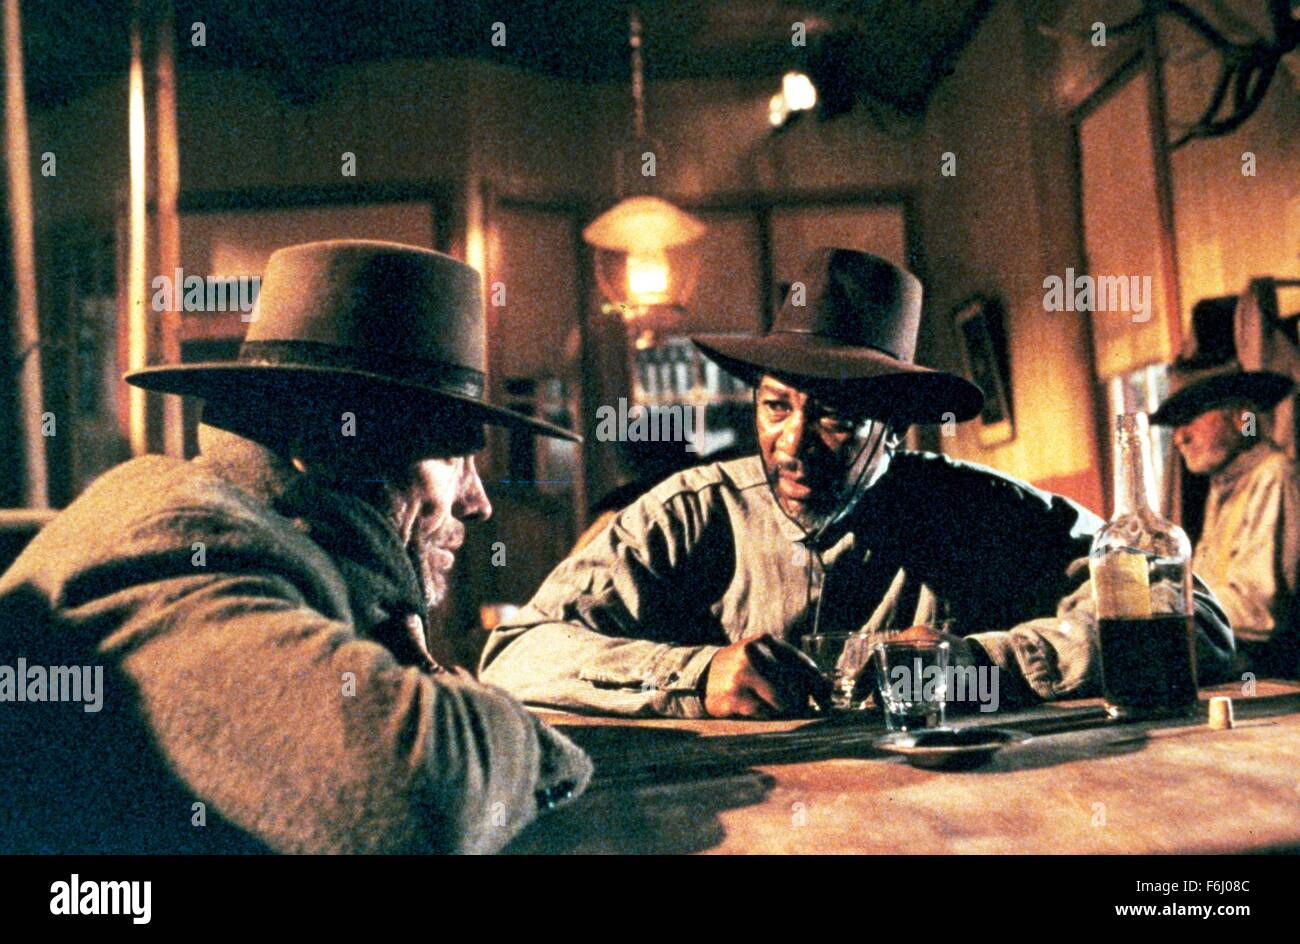 1992, Film Title: UNFORGIVEN, Director: CLINT EASTWOOD, Studio: WARNER, Pictured: CLINT EASTWOOD. (Credit Image: - Stock Image